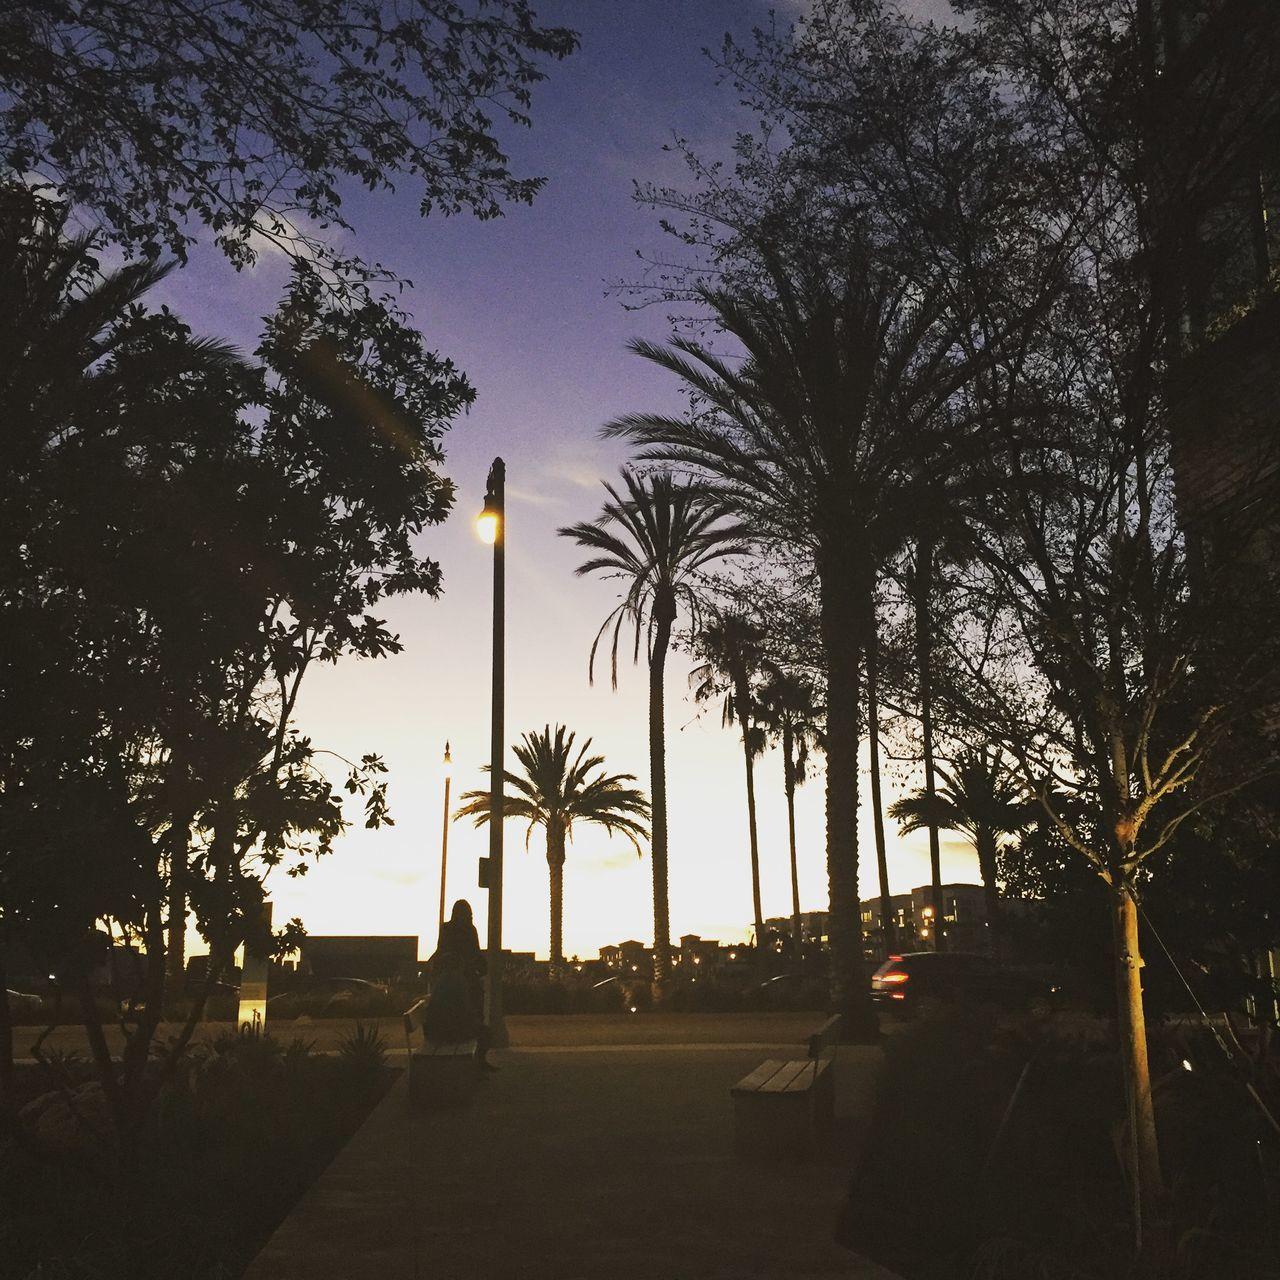 Fullscreen Playa Vista Silicon Beach La